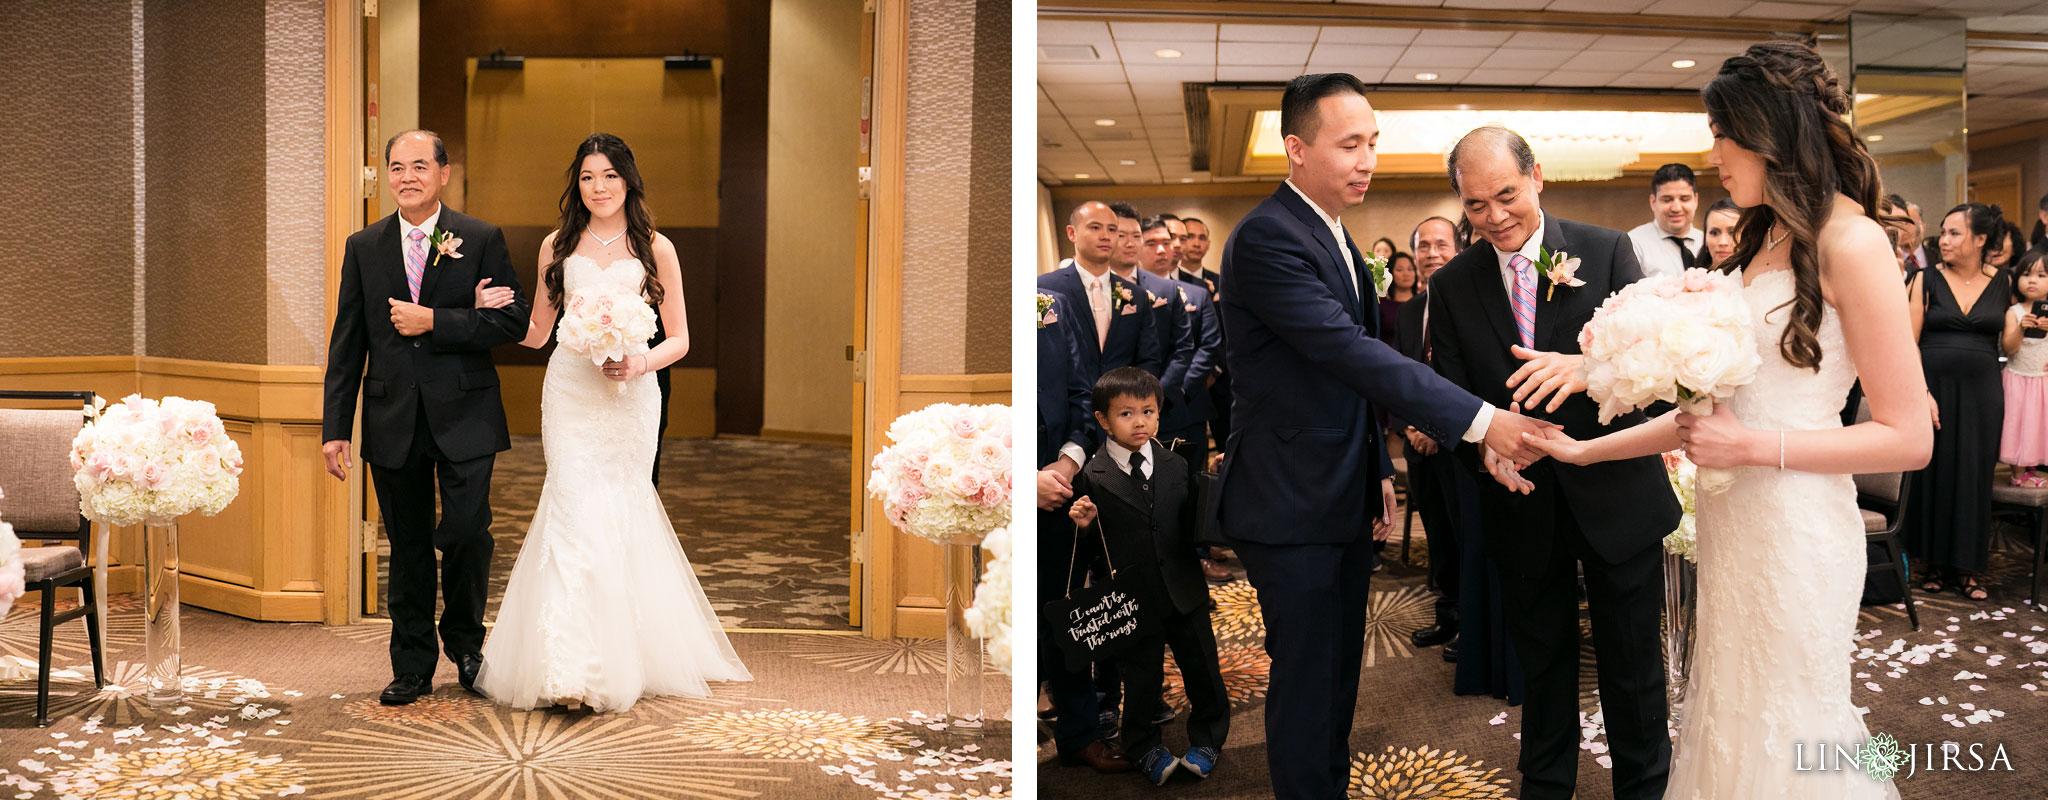 25 hilton costa mesa wedding ceremony photography